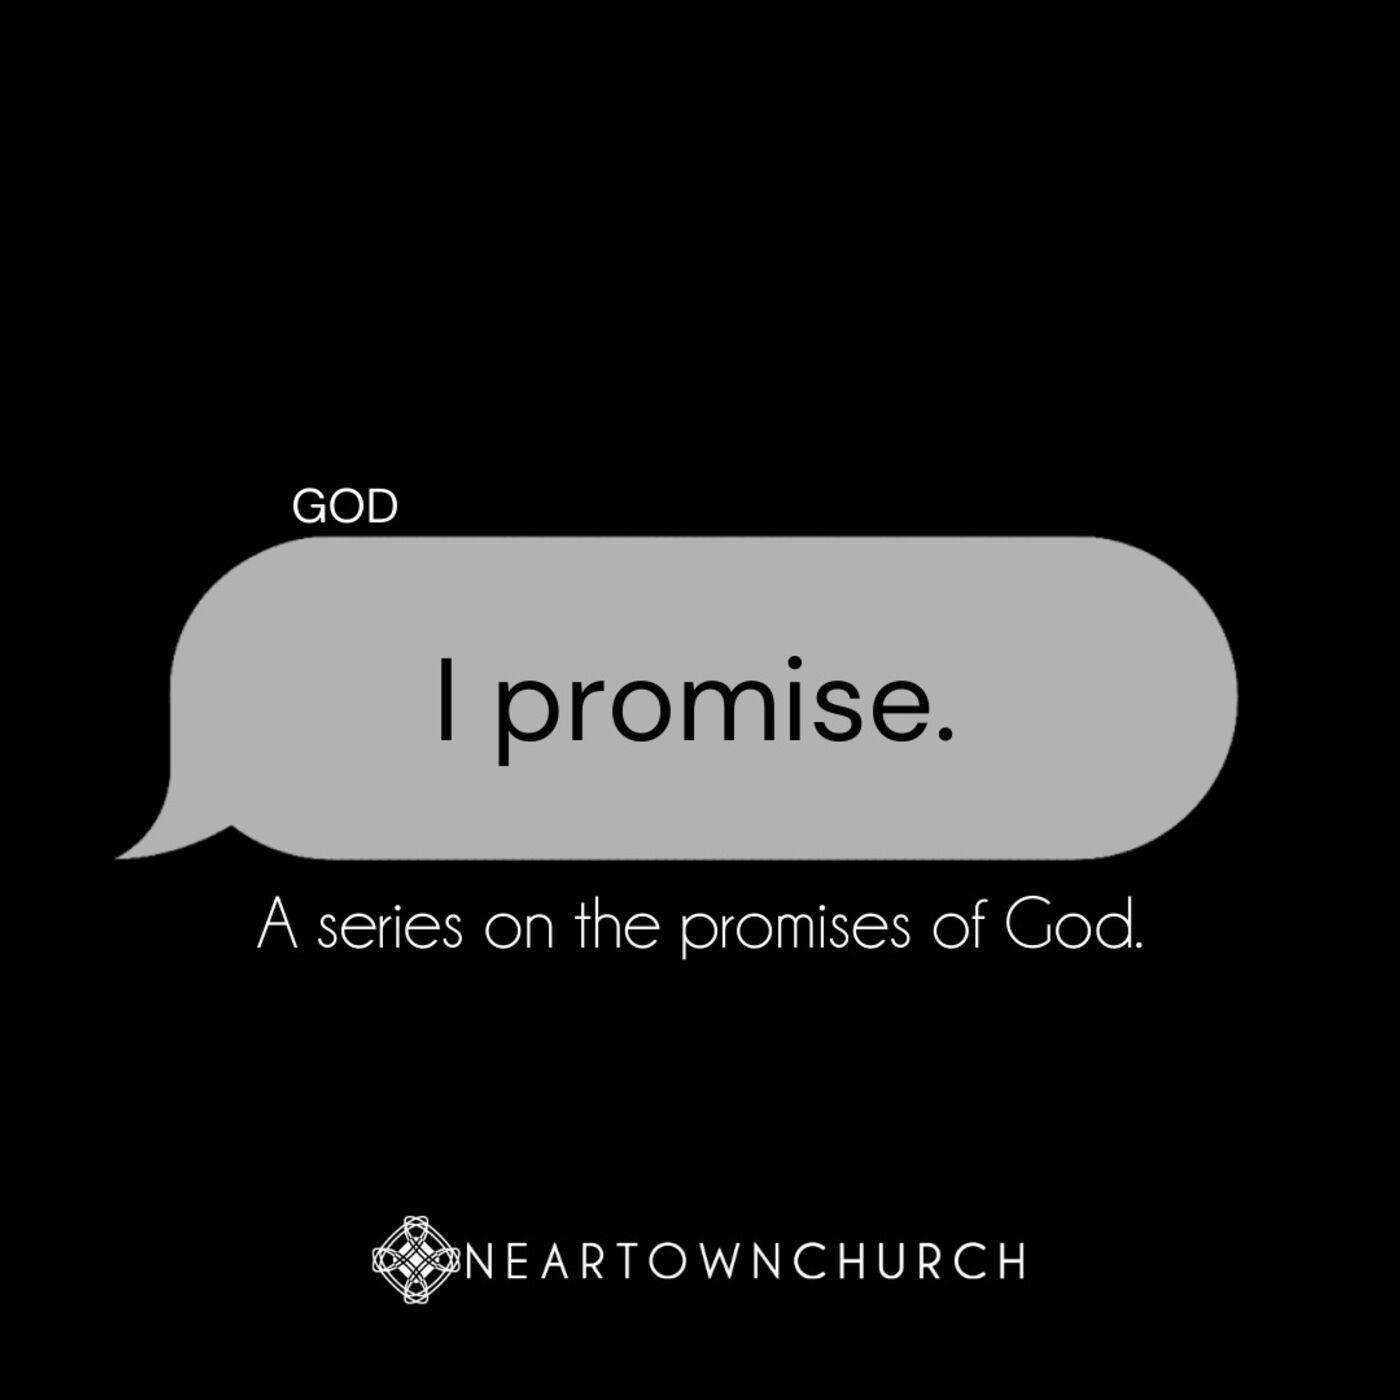 I promise. - 9.20.2020